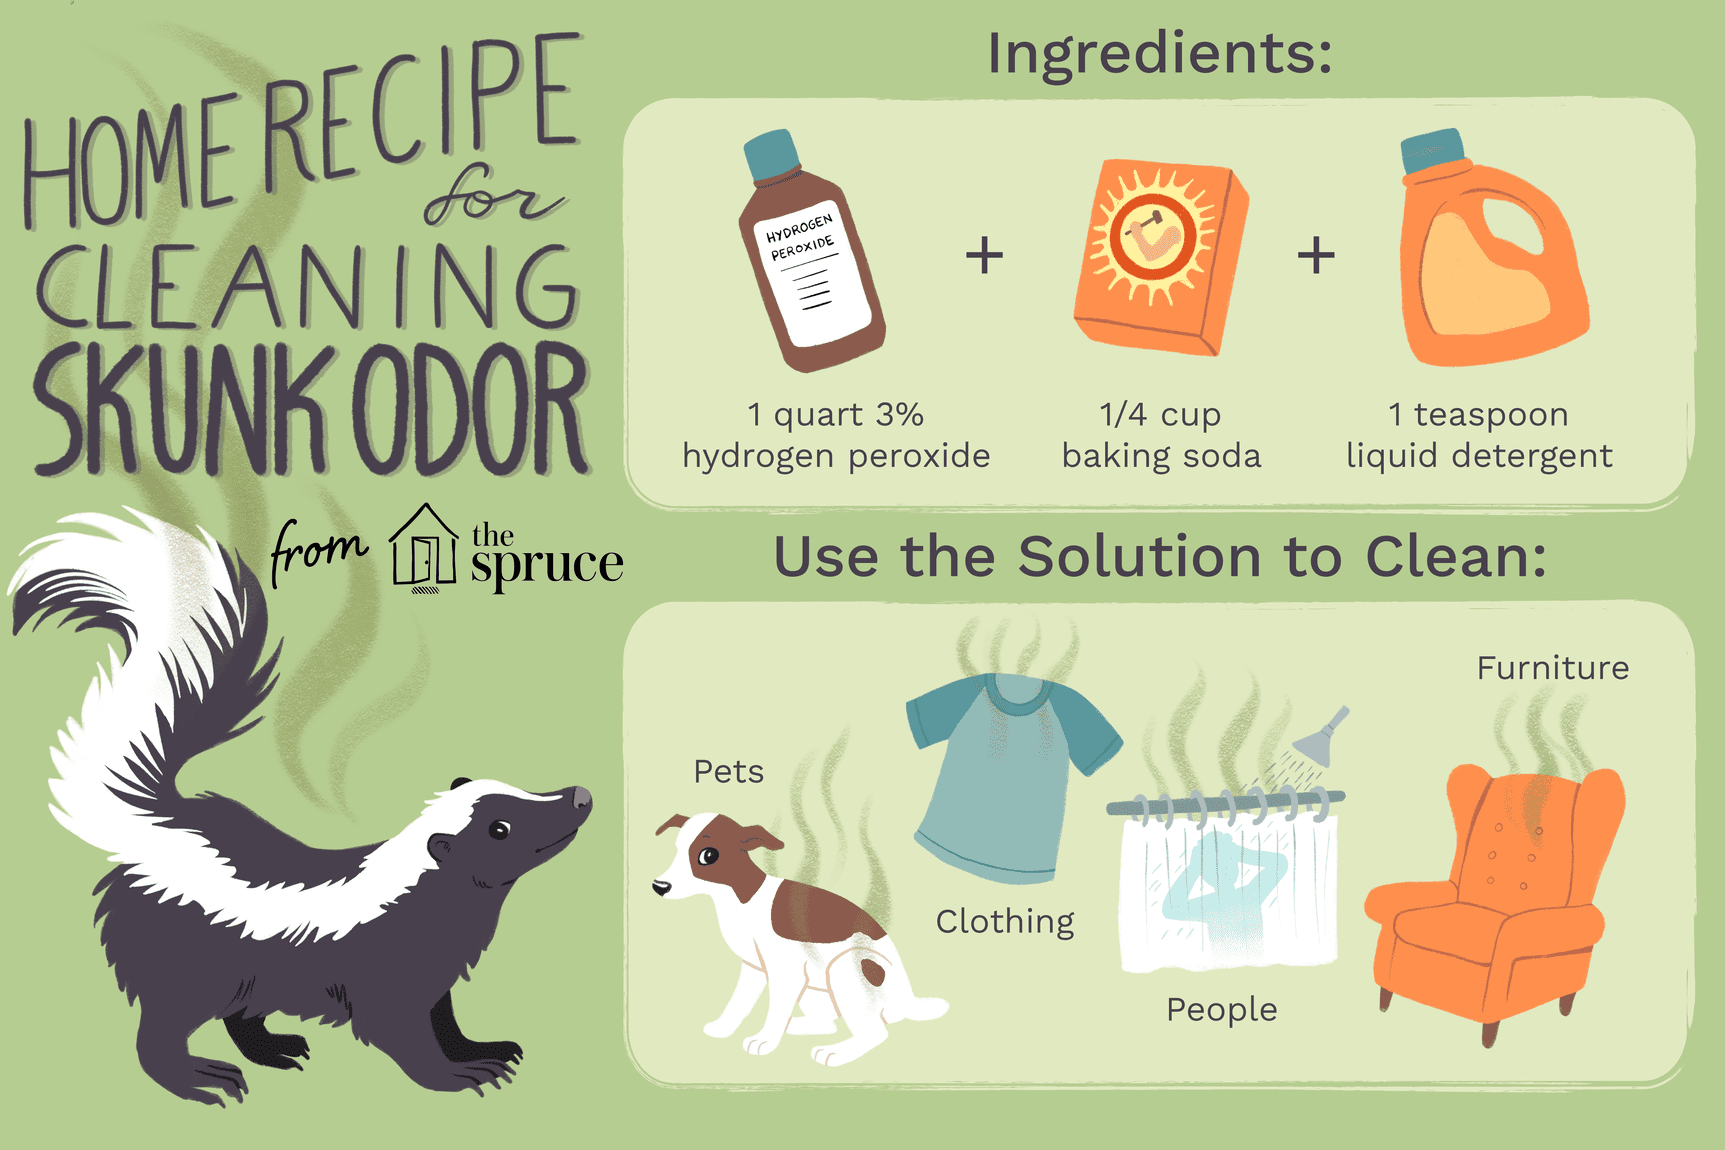 Get Rid of Skunk Odor: What Really Works | Skunk smell ...